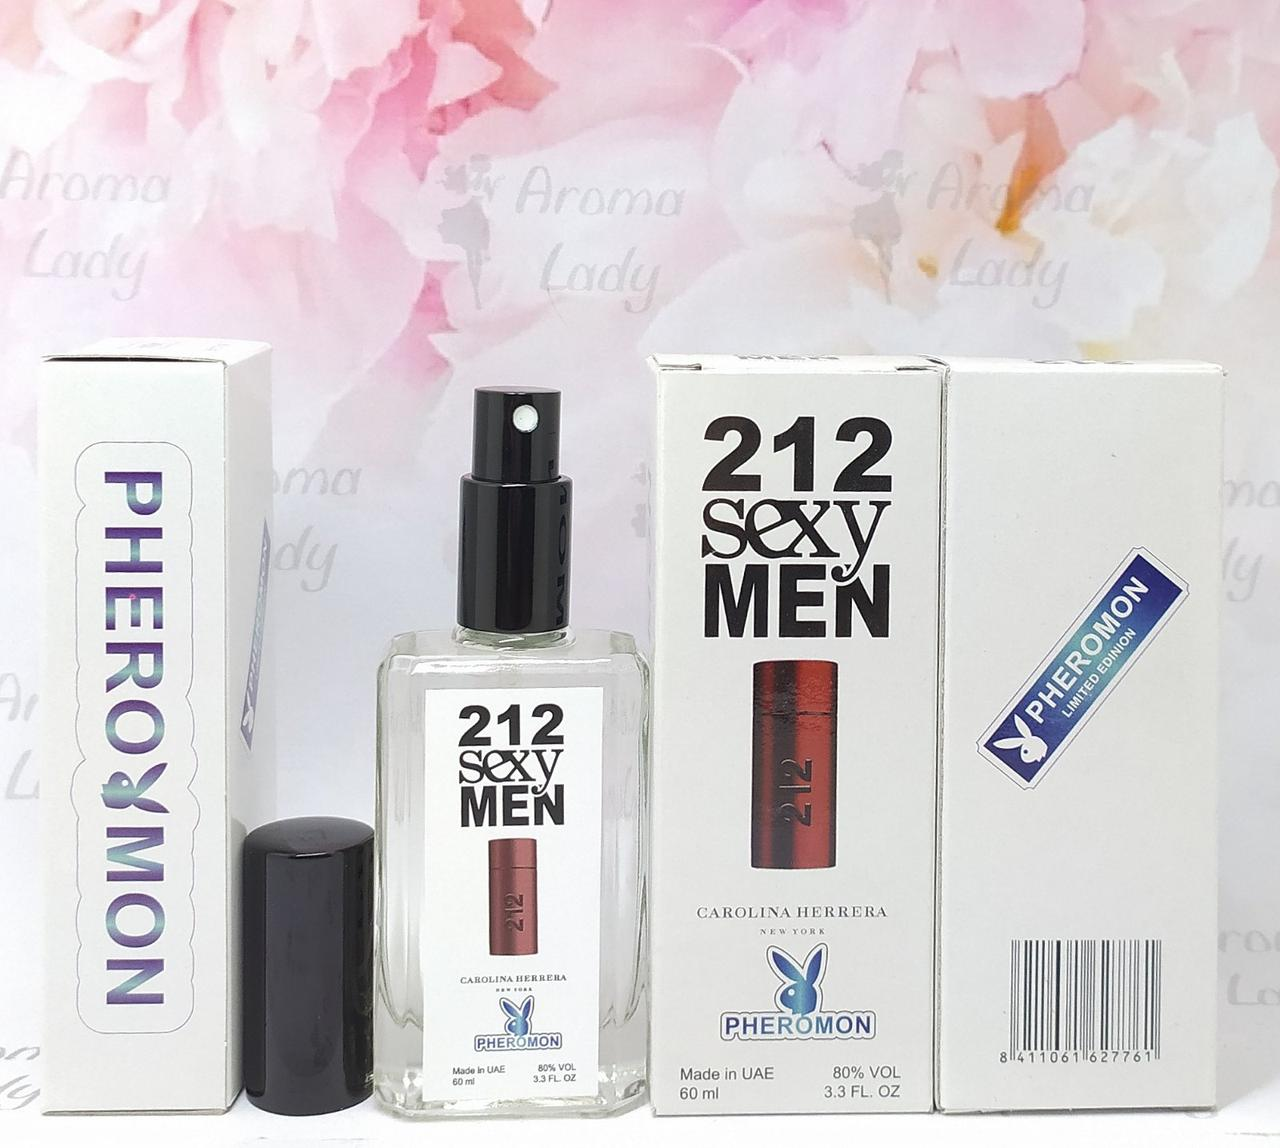 Мужской аромат Carolina Herrera 212 Sexy Men (Каролина Херрера 212 Секси Мэн) с феромонами 60 мл